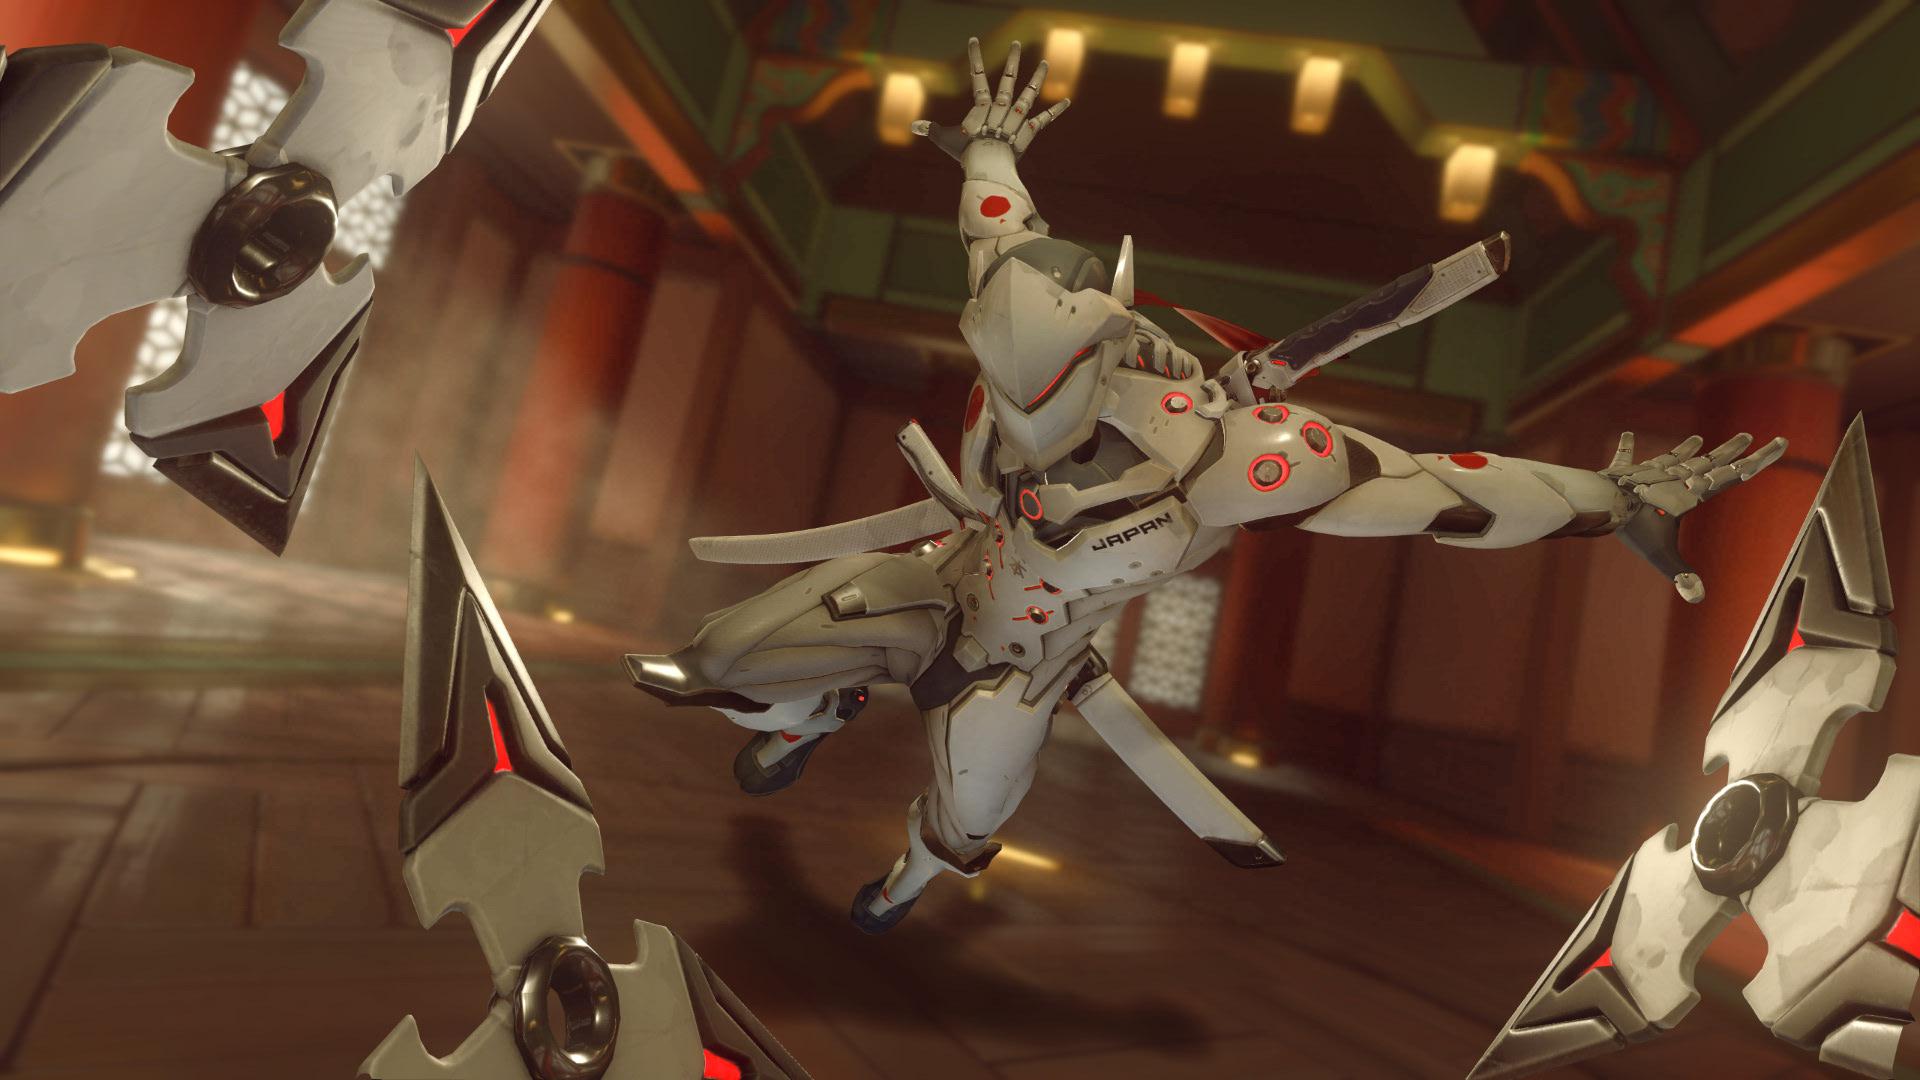 Overwatch Genji Nipon Skin Shuriken